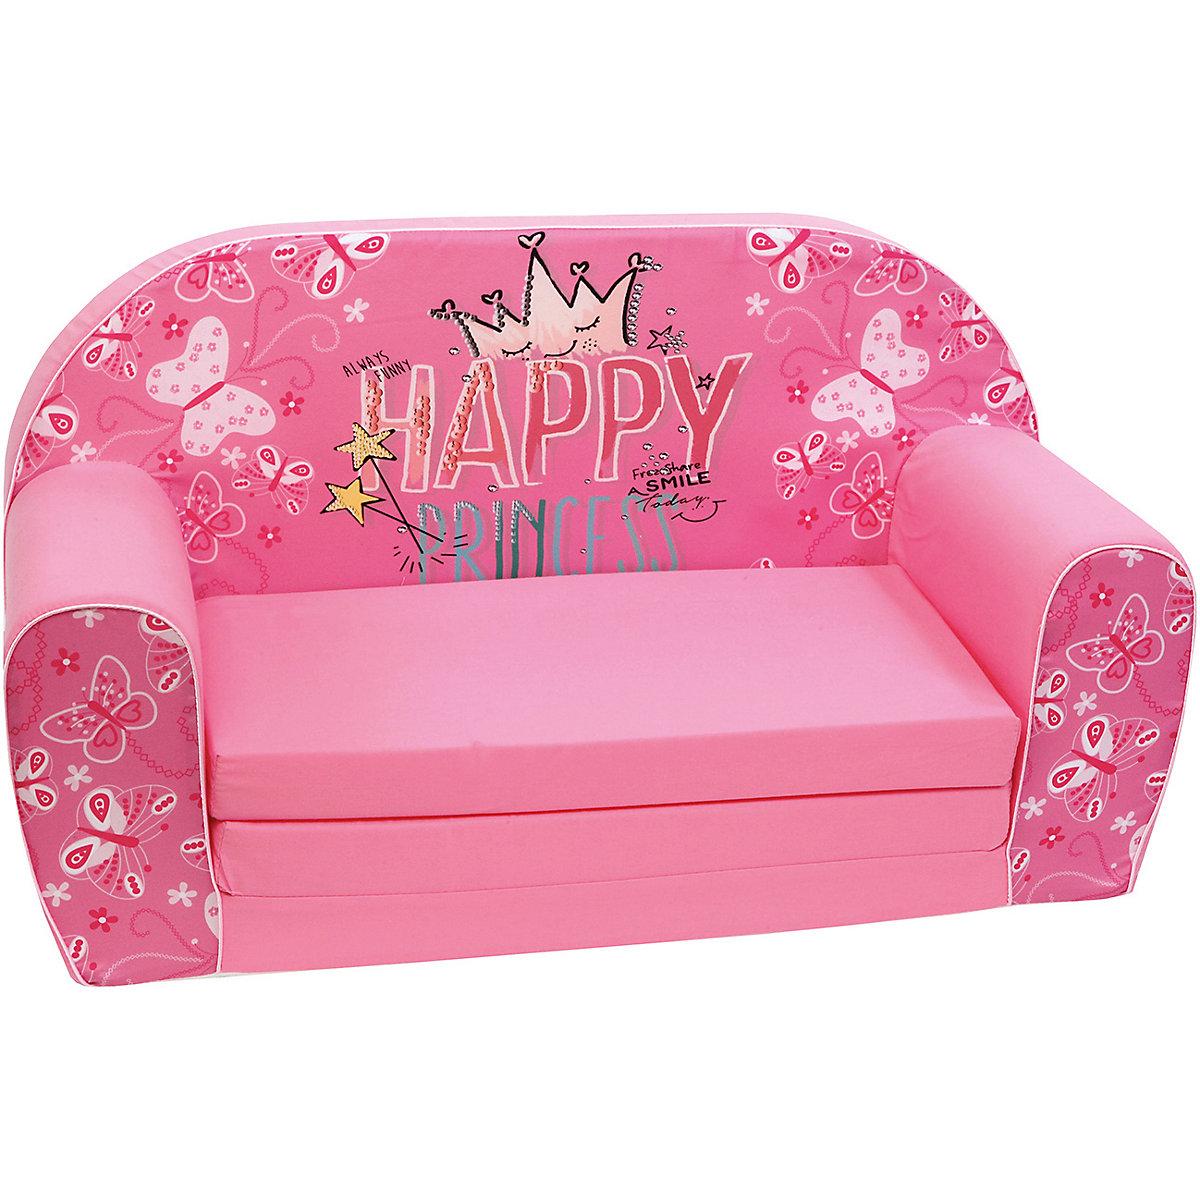 Mini-Schlafsofa Princess Lilly, rosa, knorr-baby | myToys